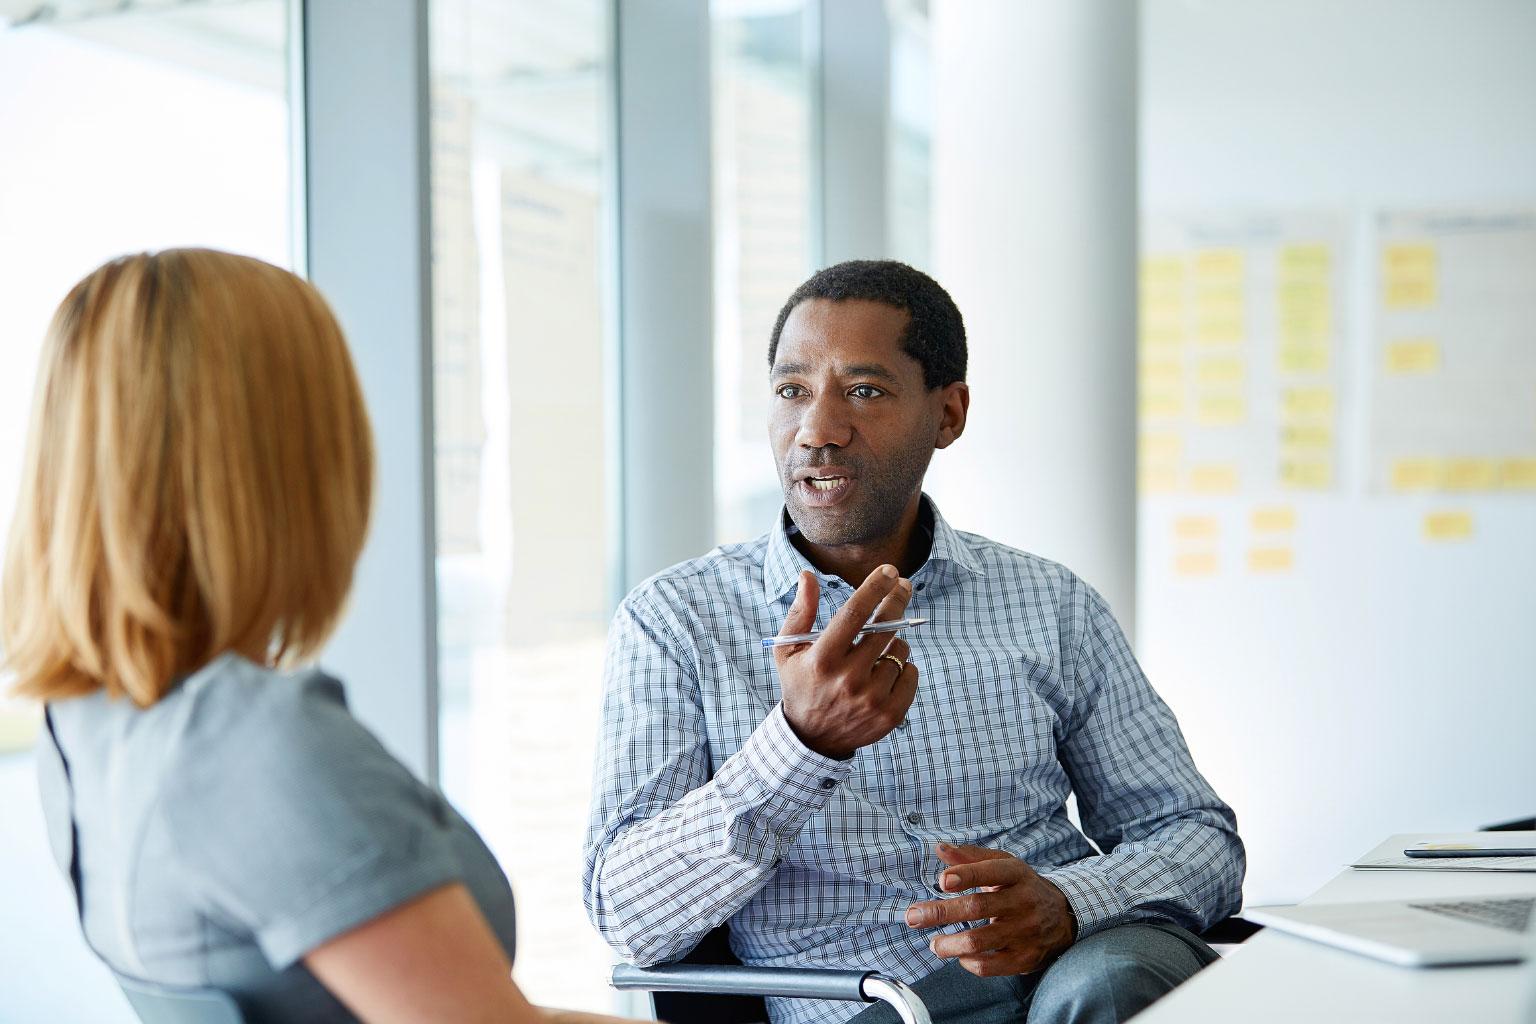 Pair discussing finsit financial figures